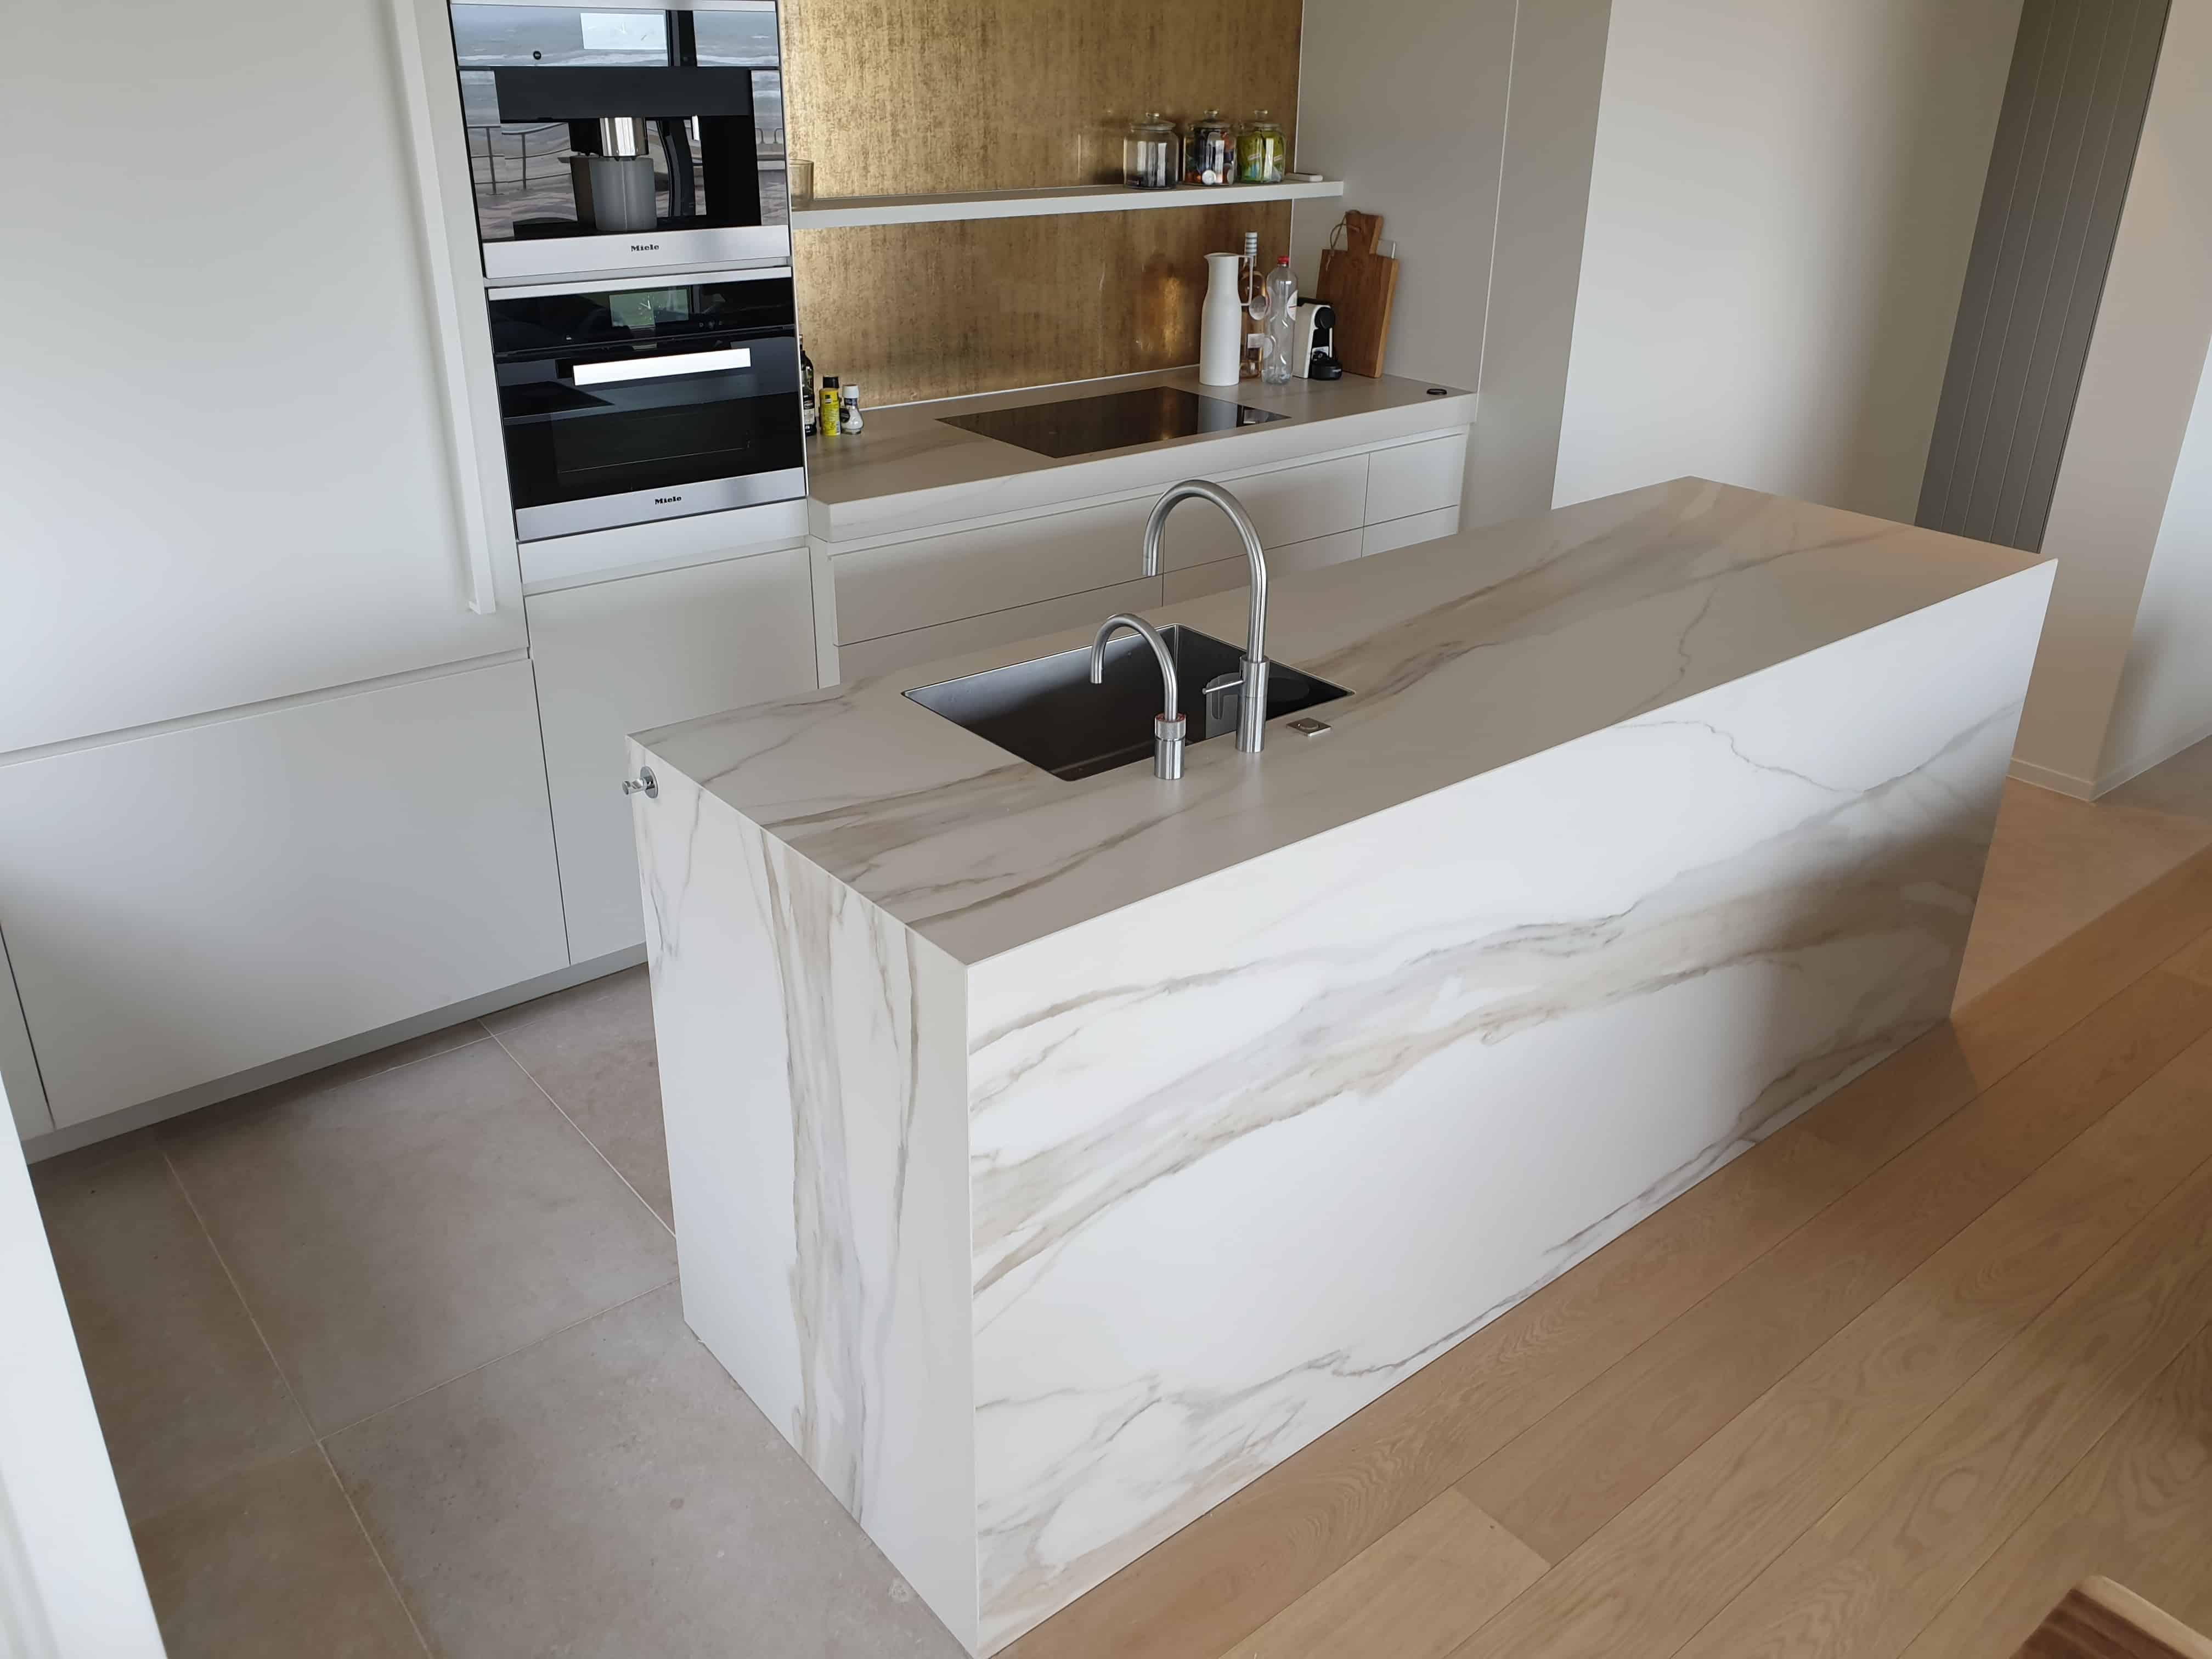 Marmer XXL tegels in keuken Oostende - keuken aanrecht in marmer